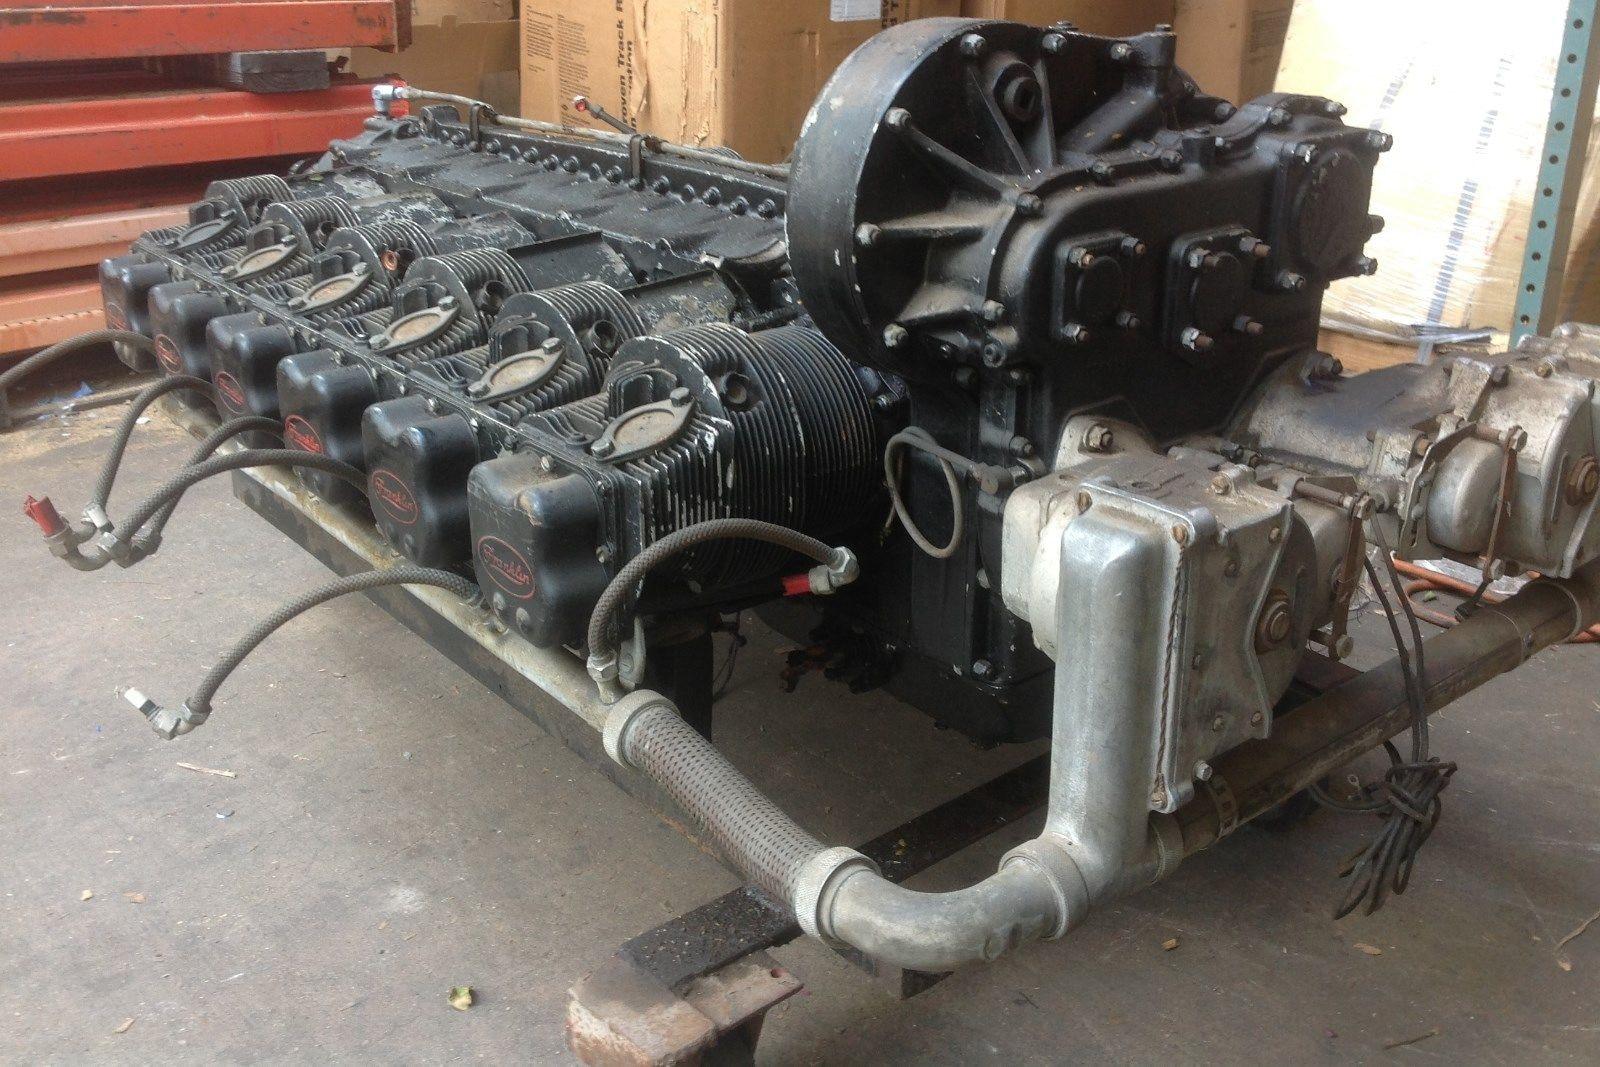 Just Listed Franklin 0 805 Air Cooled Flat Twelve Engine